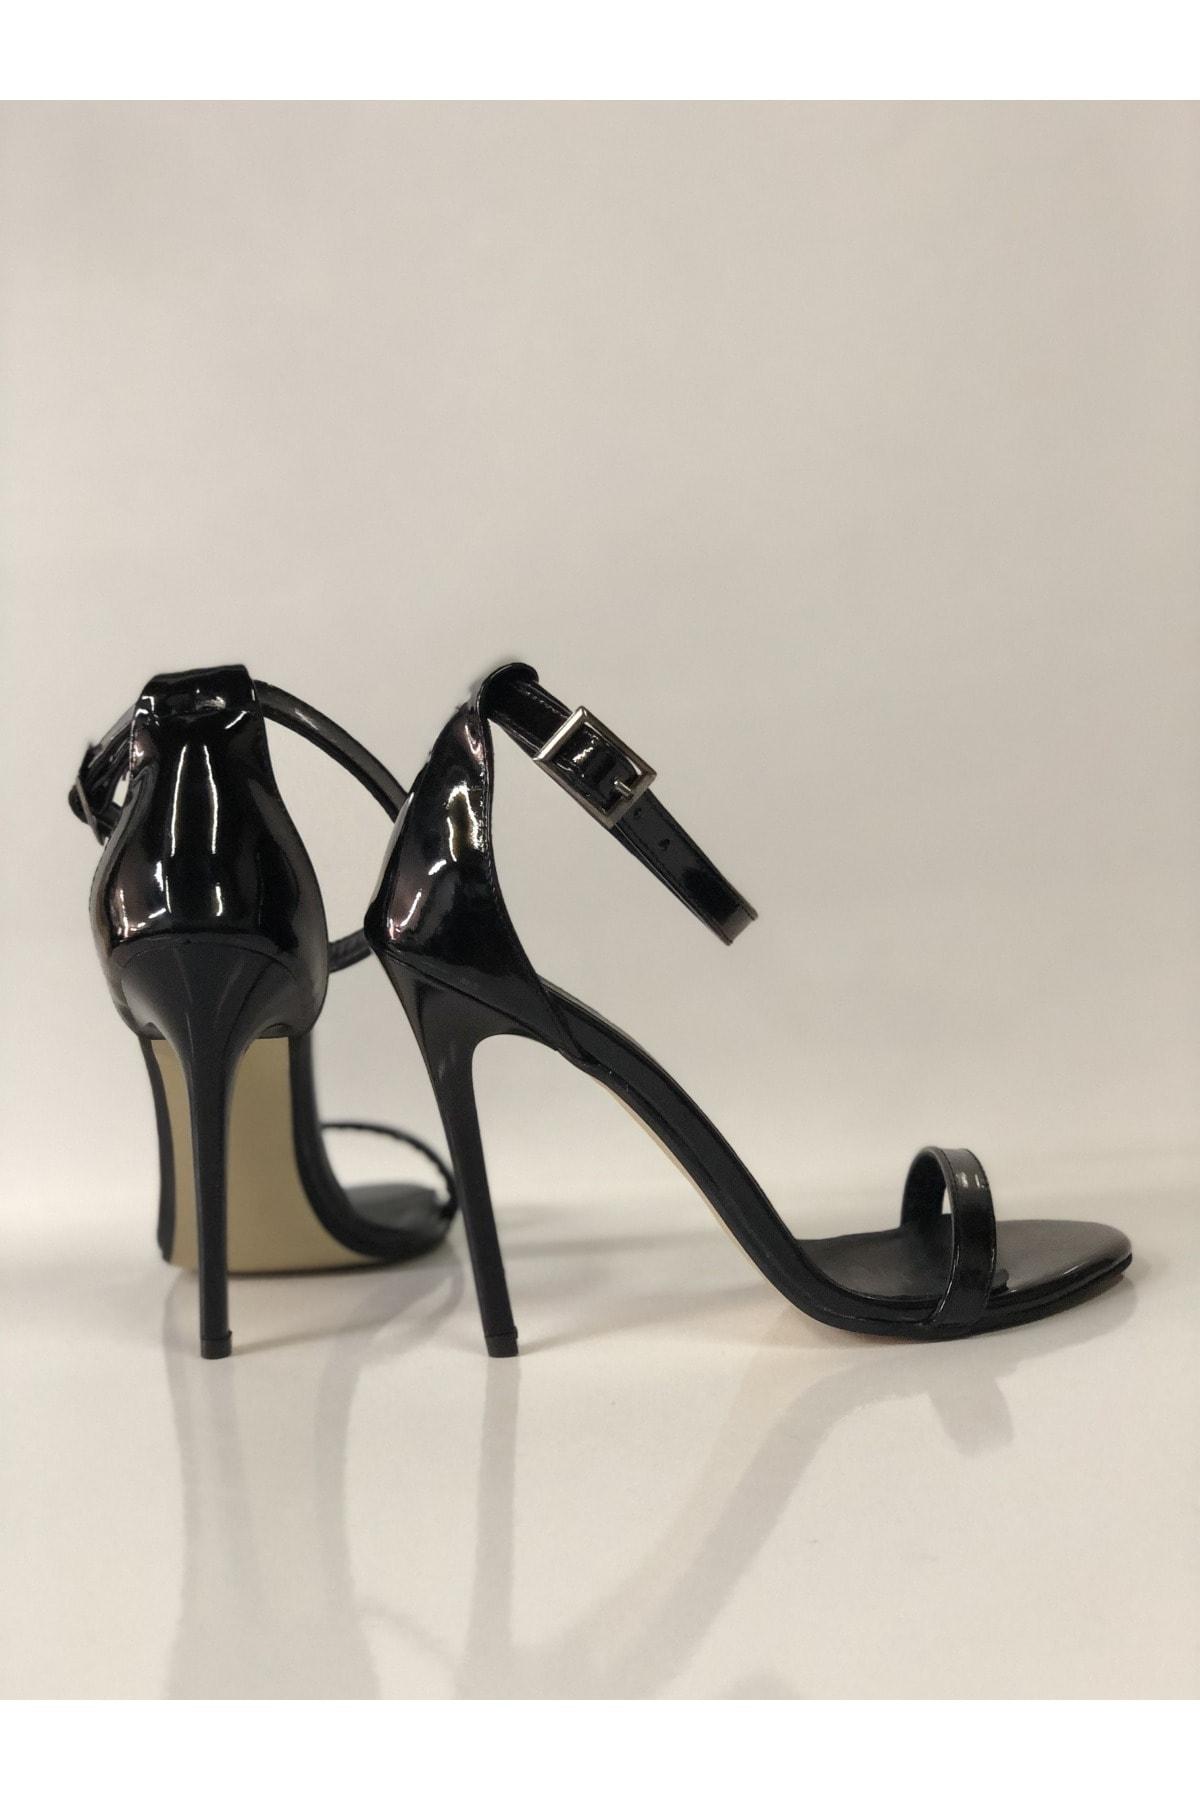 HAYYSHOES Kadın Siyah Topuklu Sandalet 2